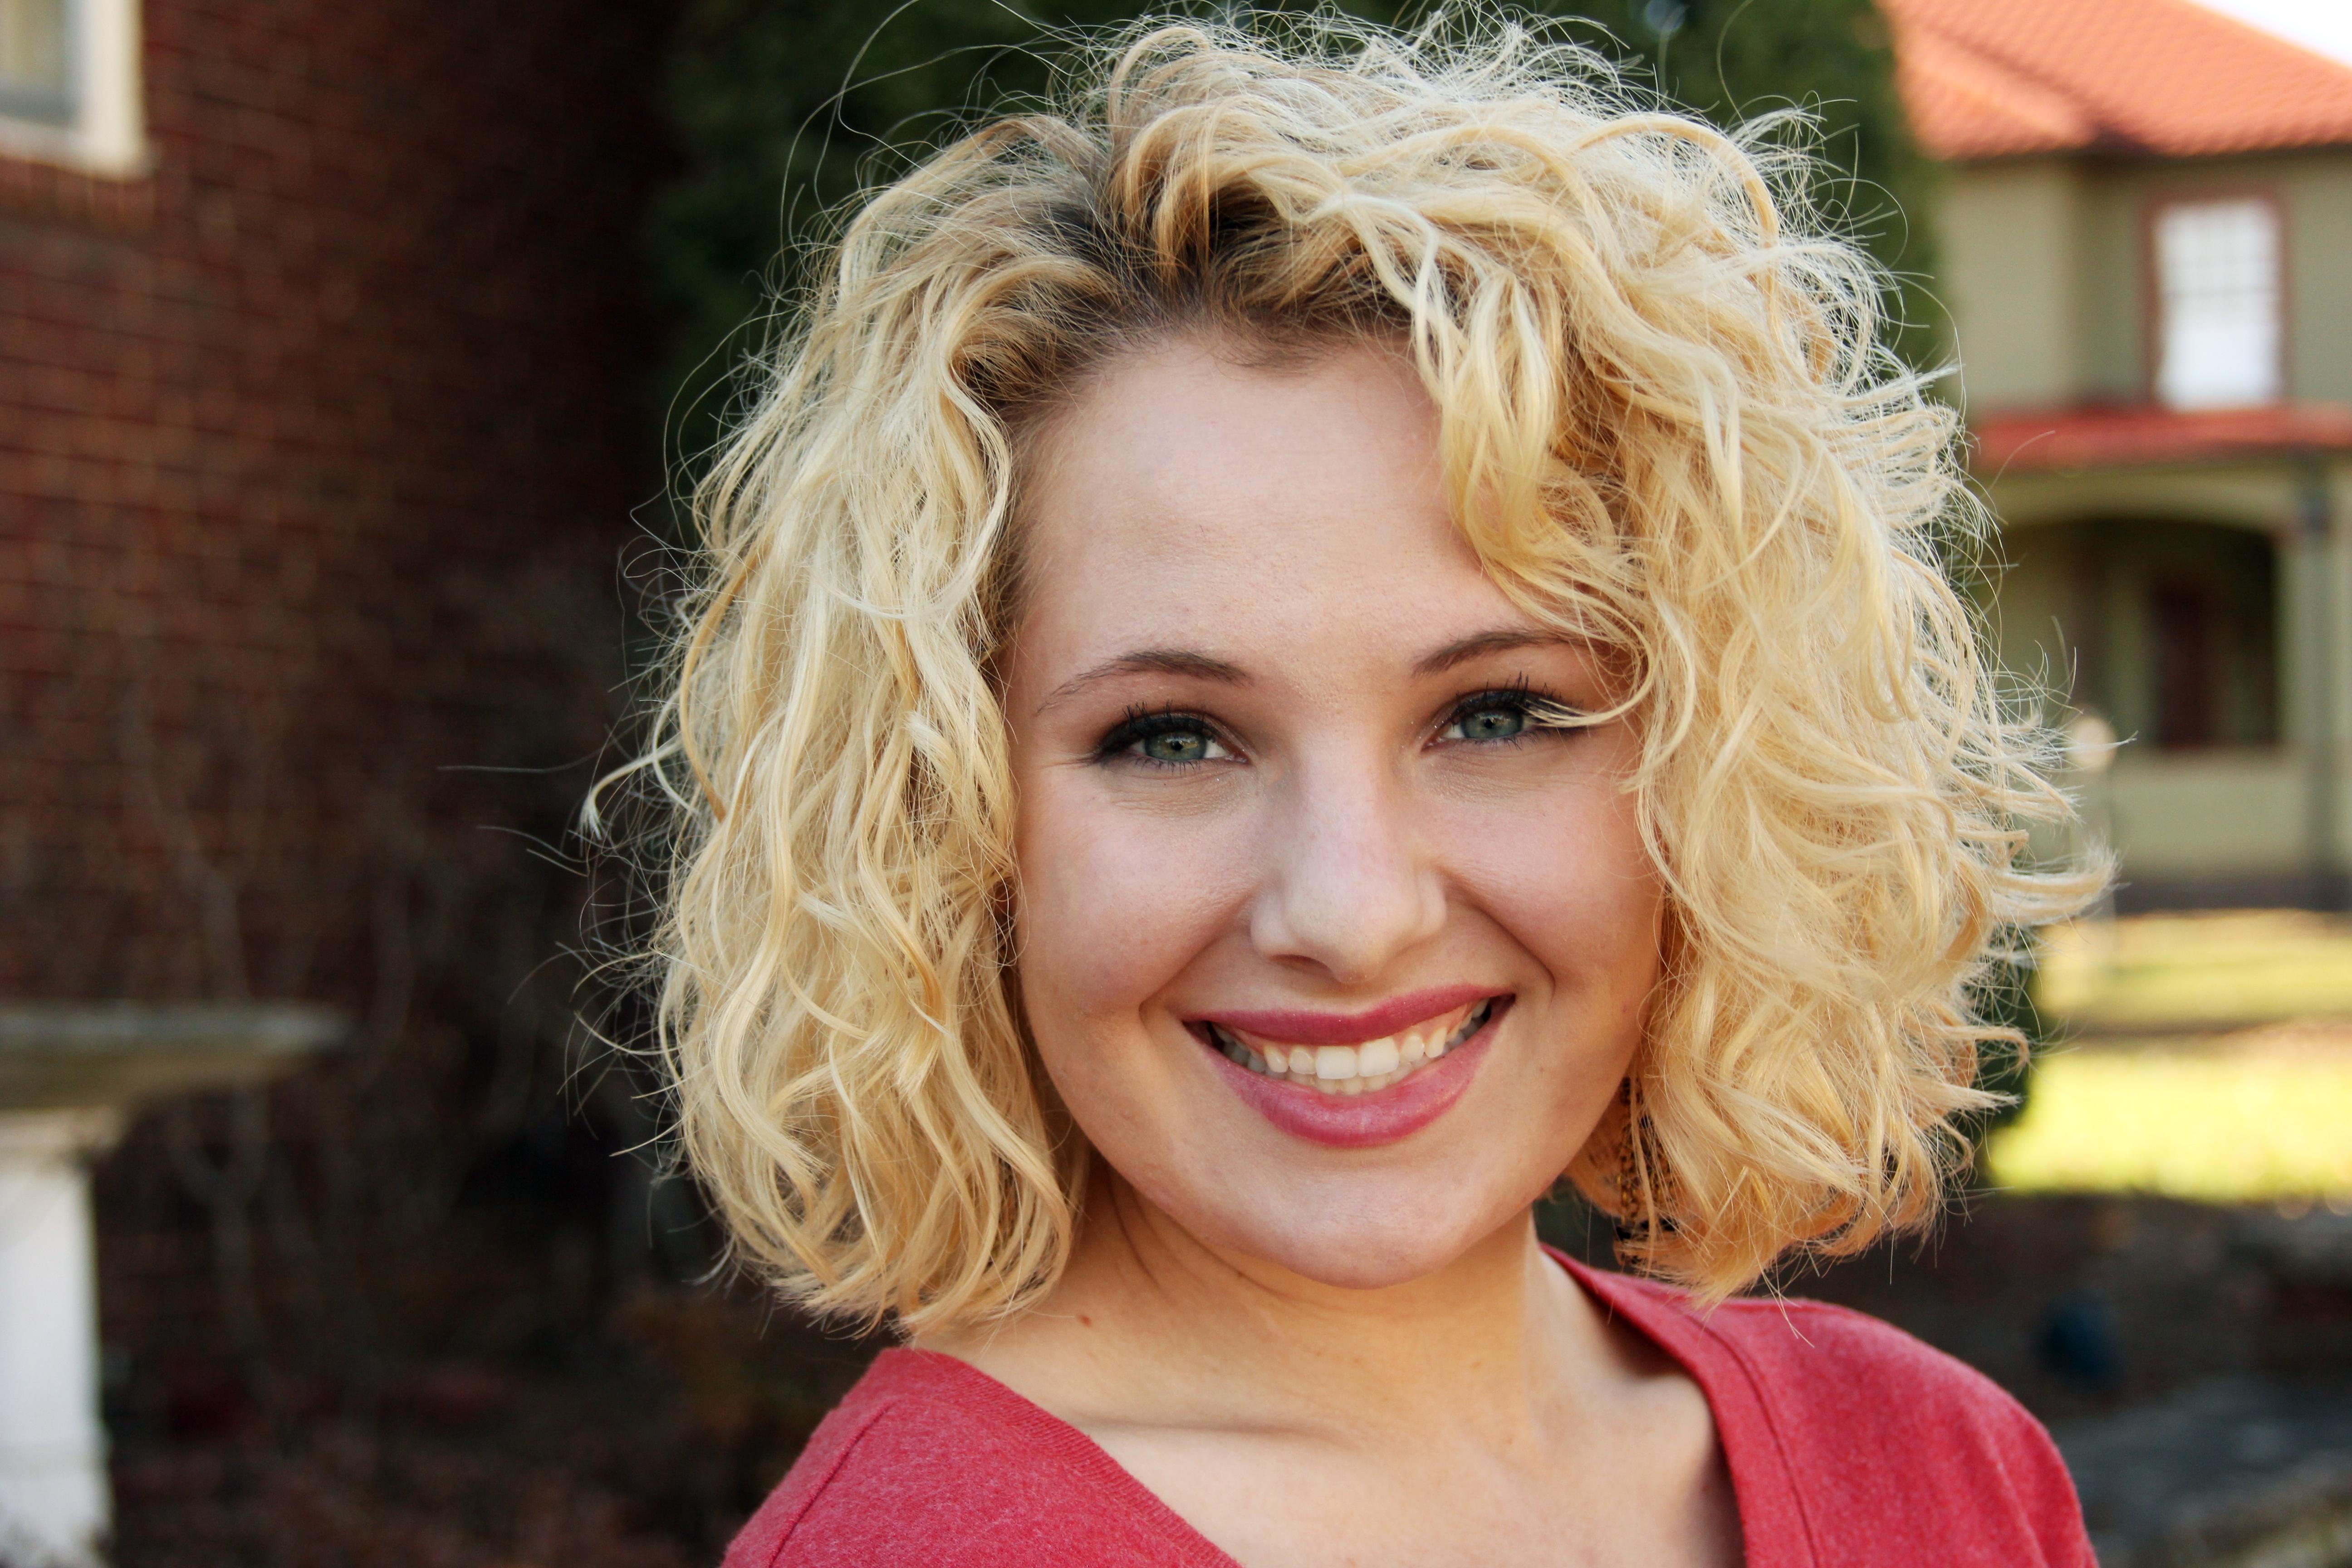 Frieda Peanuts Naturally Curly Hair